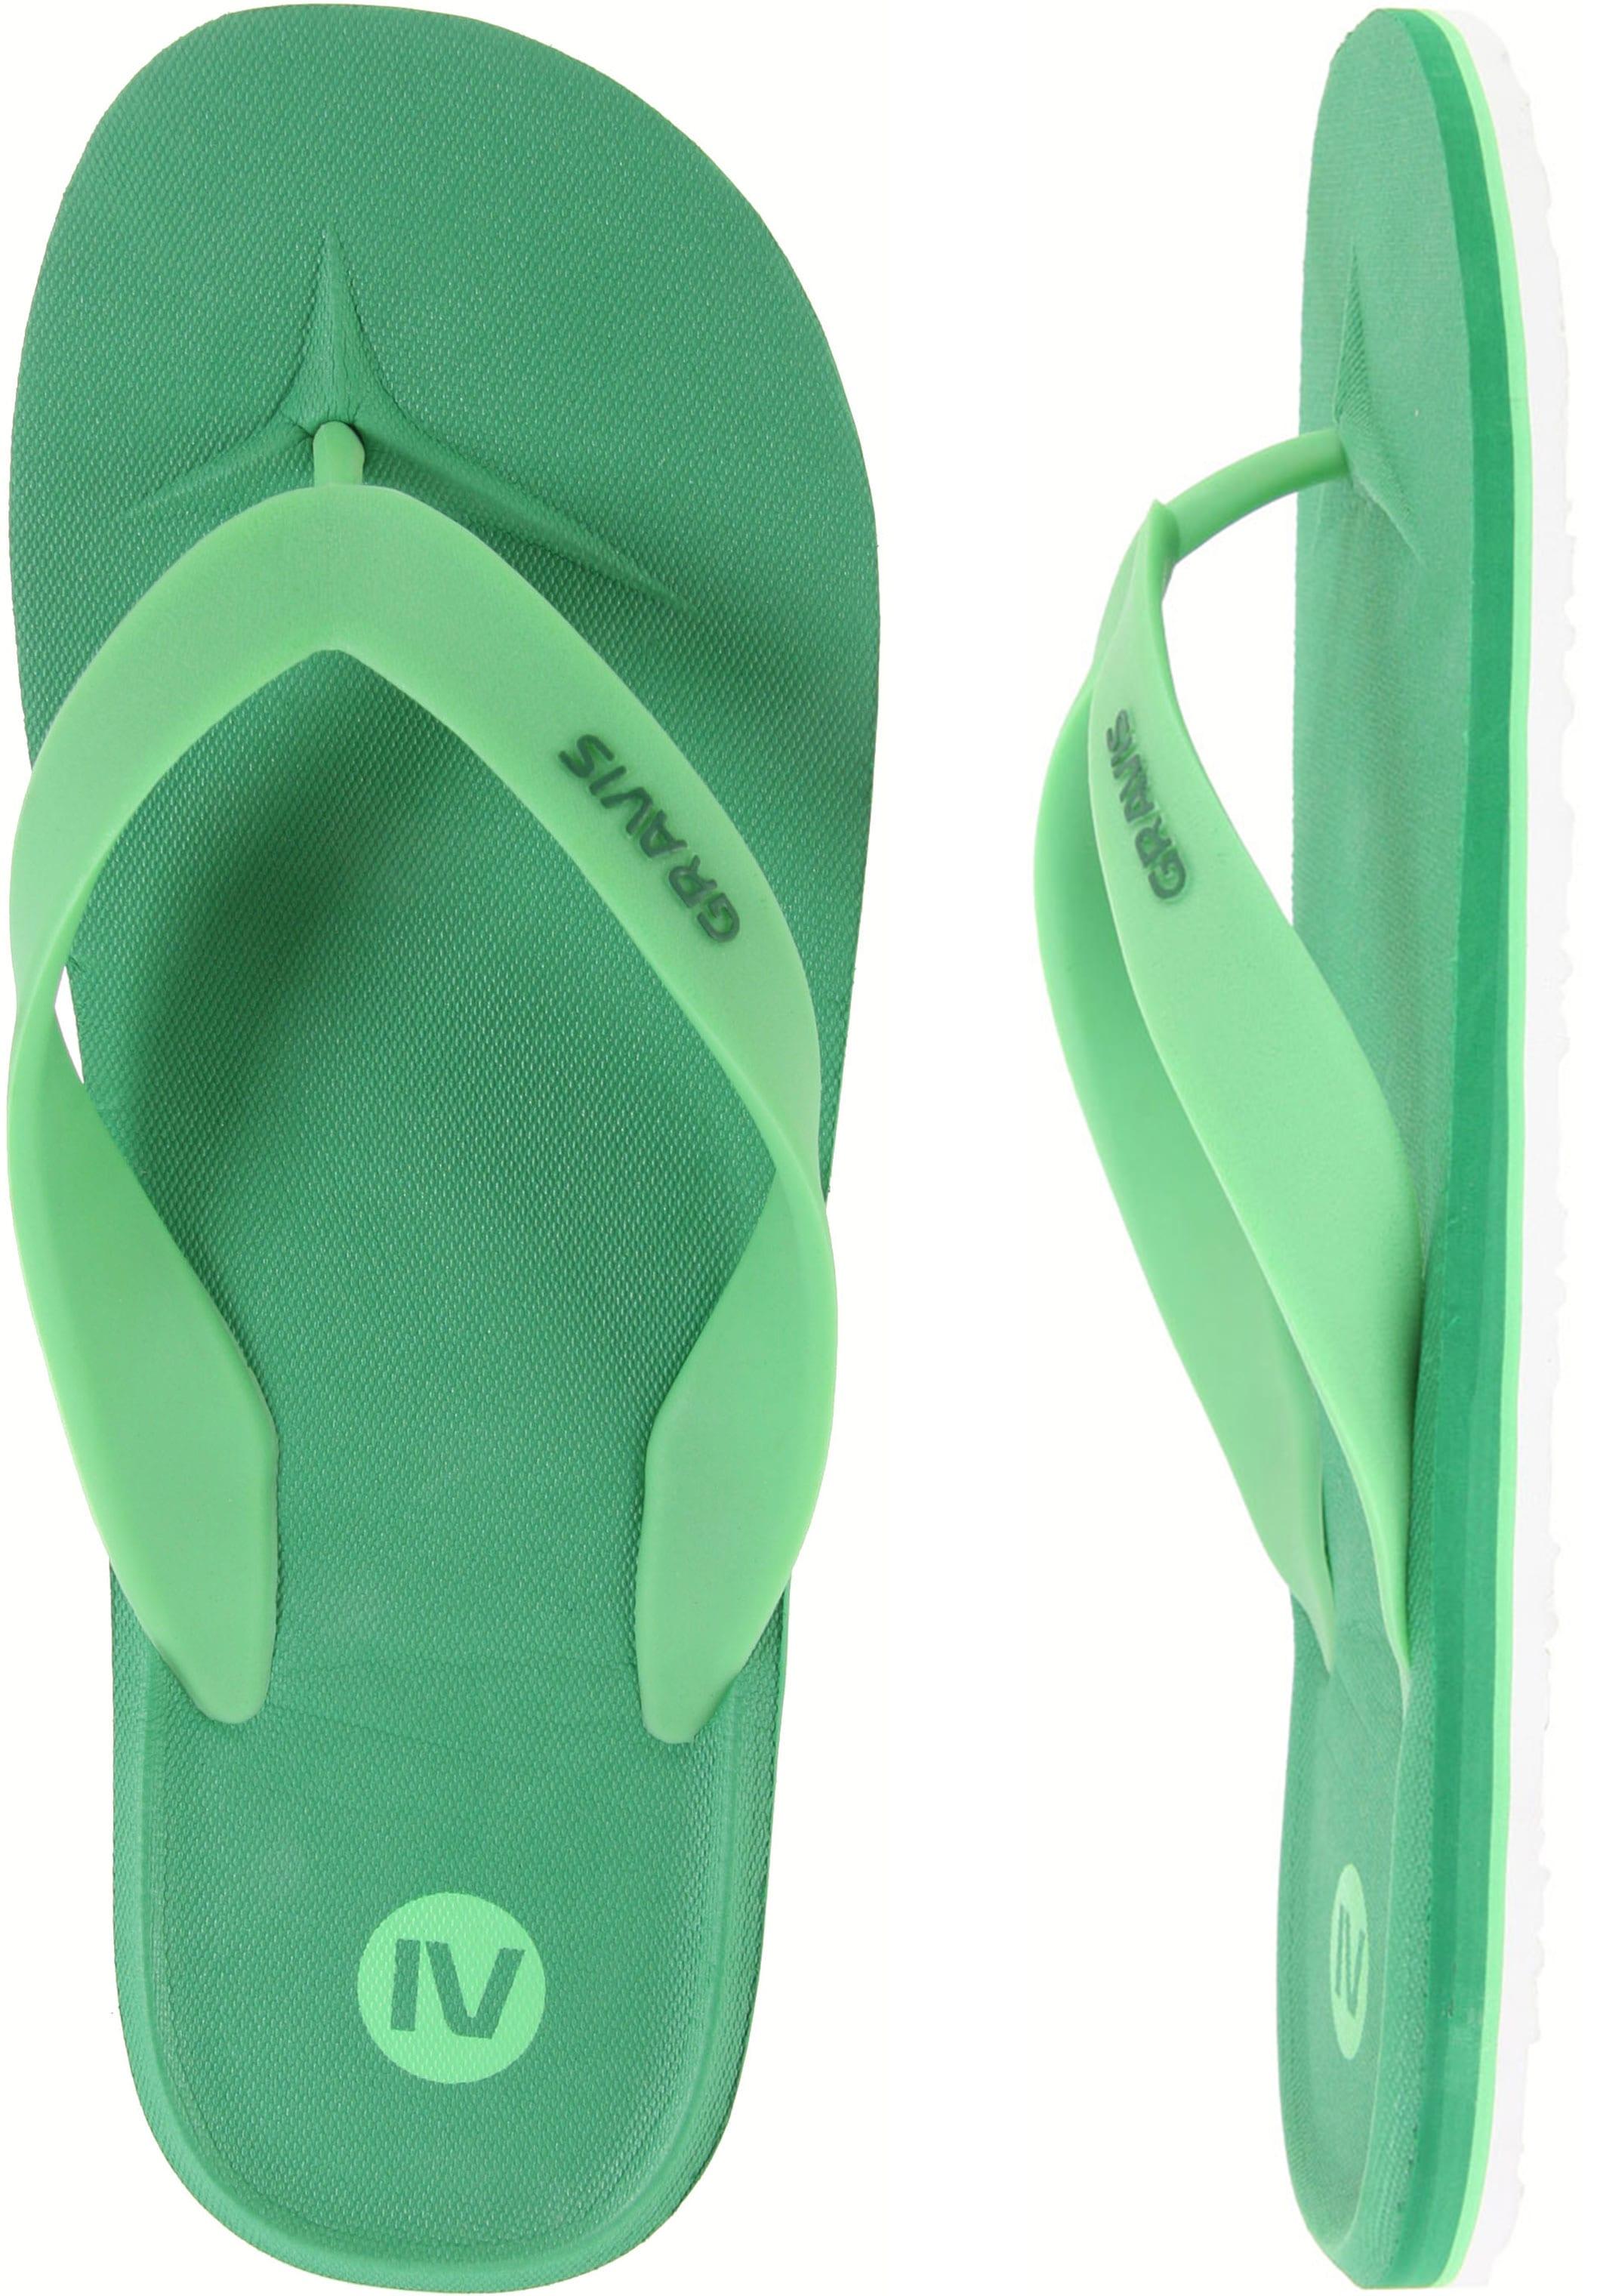 Gravis Waterpipes Sandals - Mens - 9 US - Green